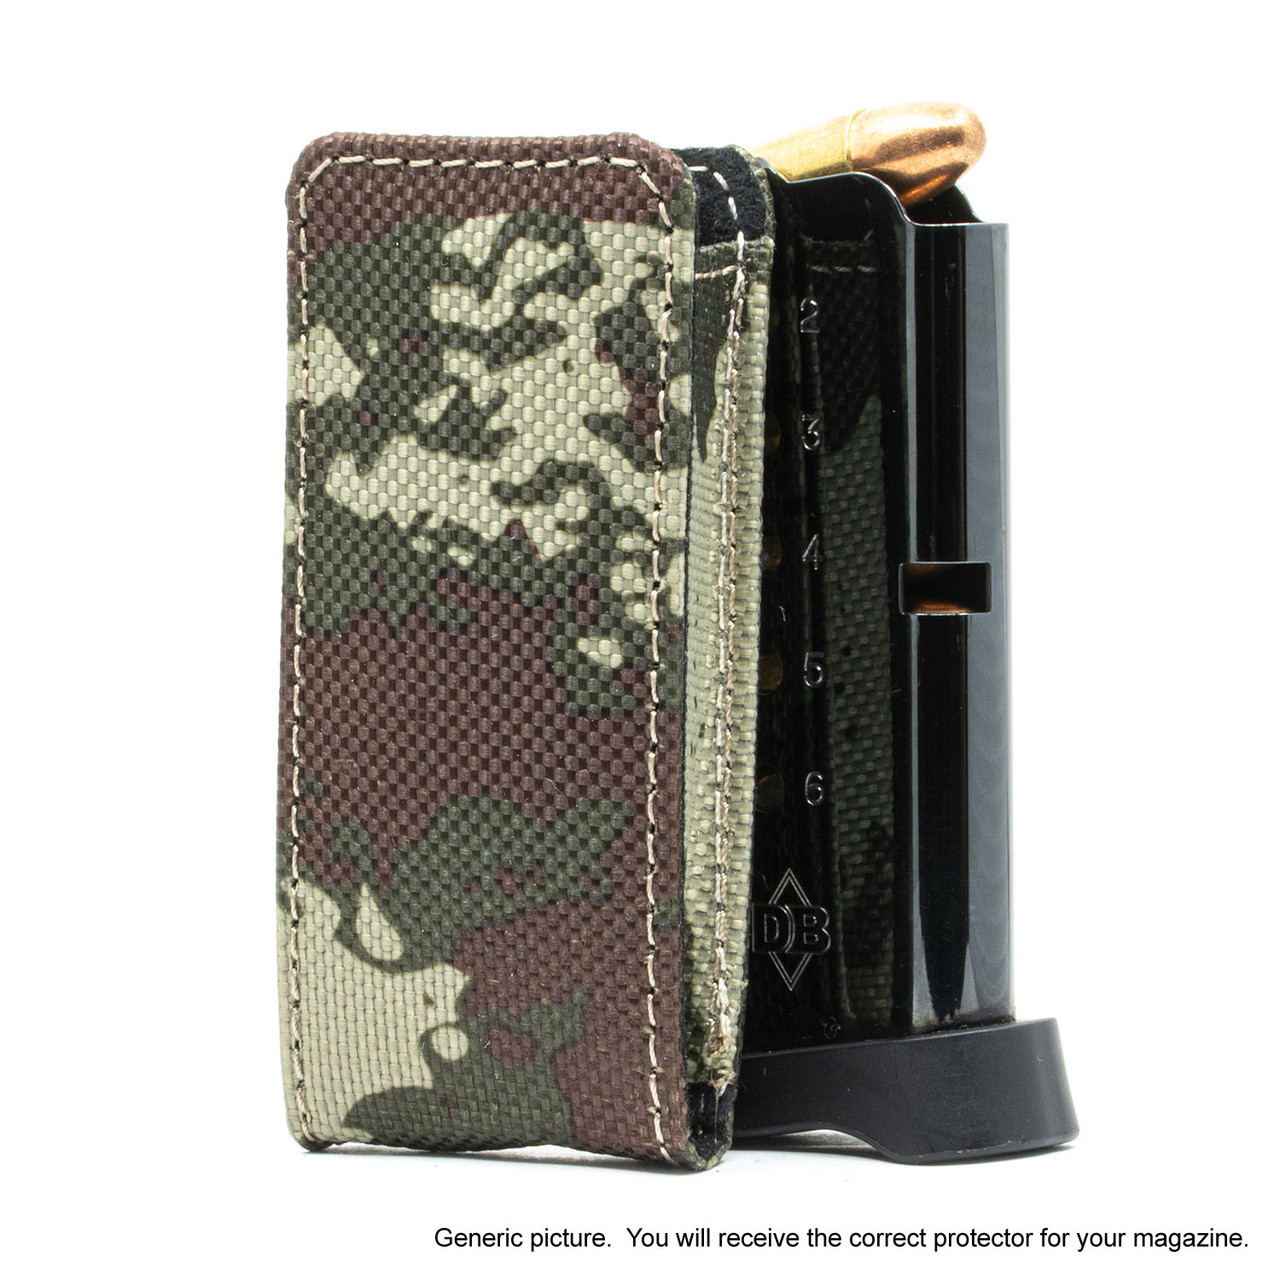 CZ 2075 Rami Camouflage Nylon Magazine Pocket Protector